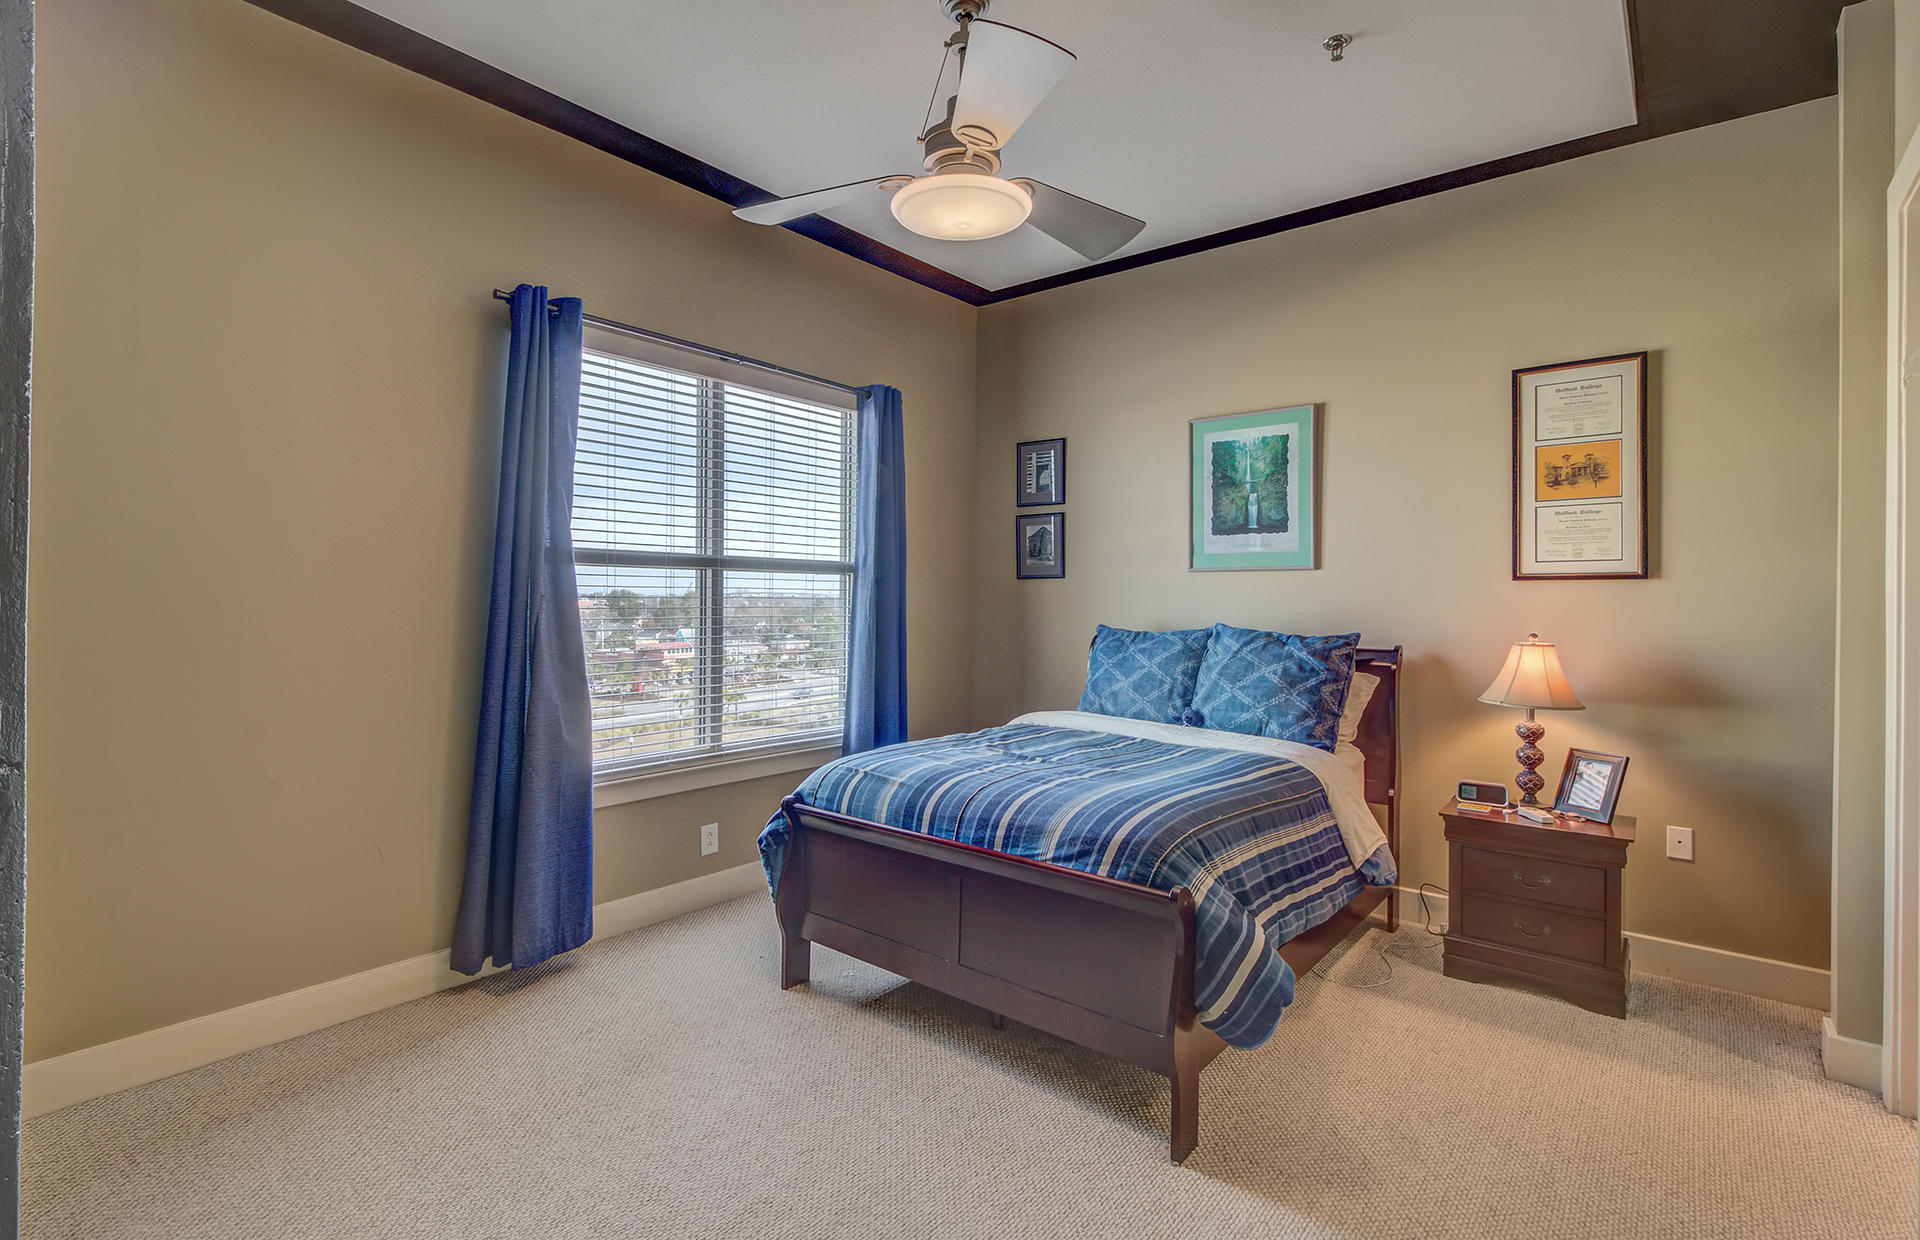 Bee Street Lofts Homes For Sale - 150 Bee, Charleston, SC - 15